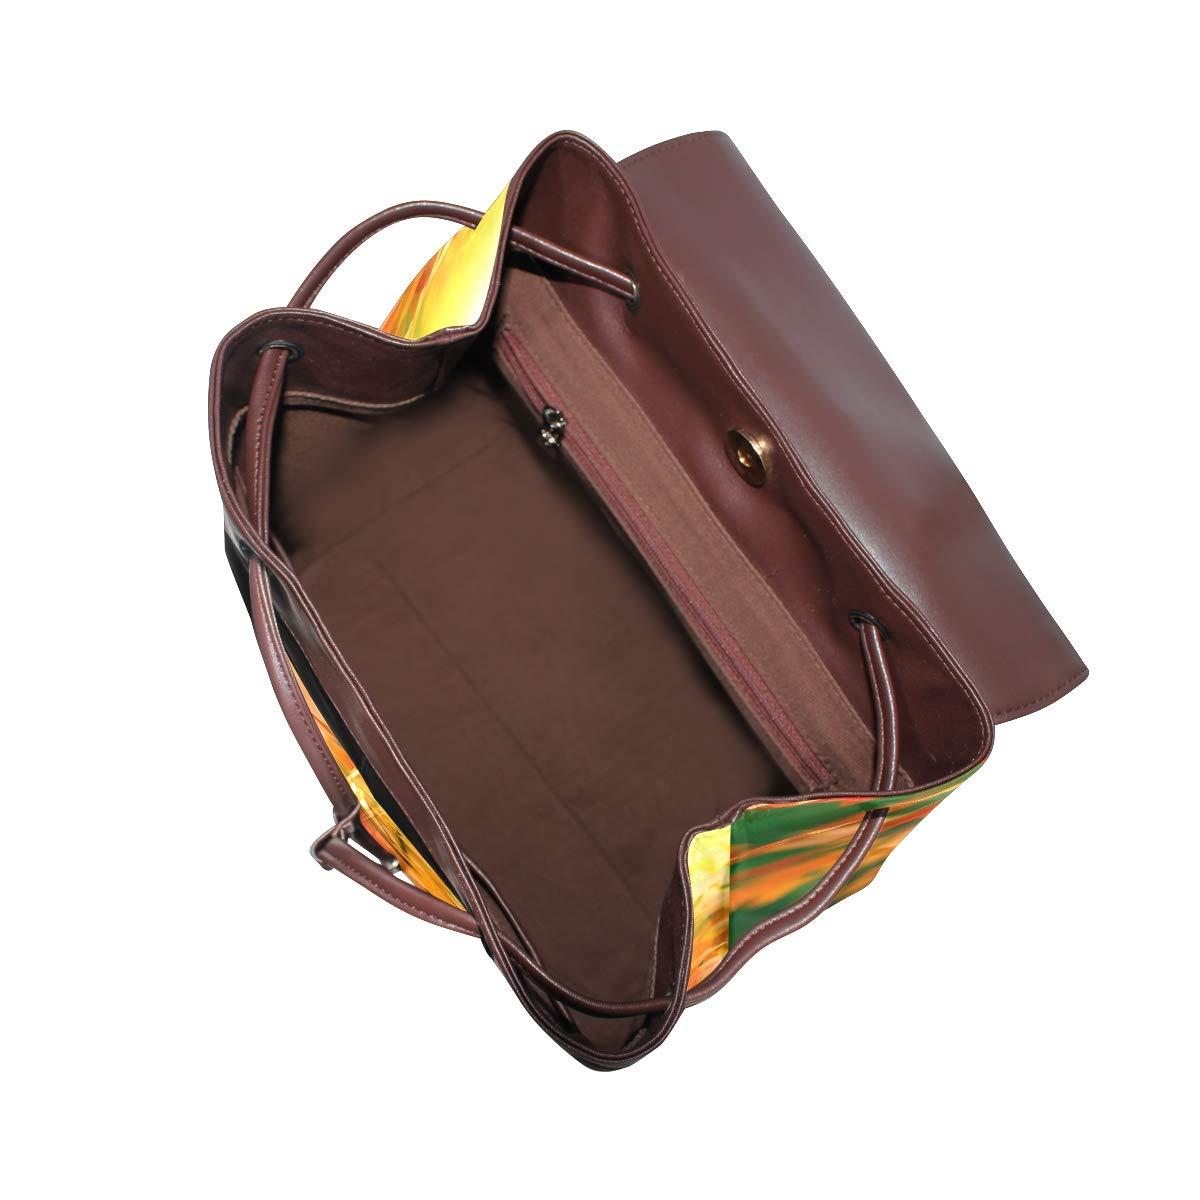 KEAKIA Women PU Leather Autumn Leaves Backpack Purse Travel School Shoulder Bag Casual Daypack